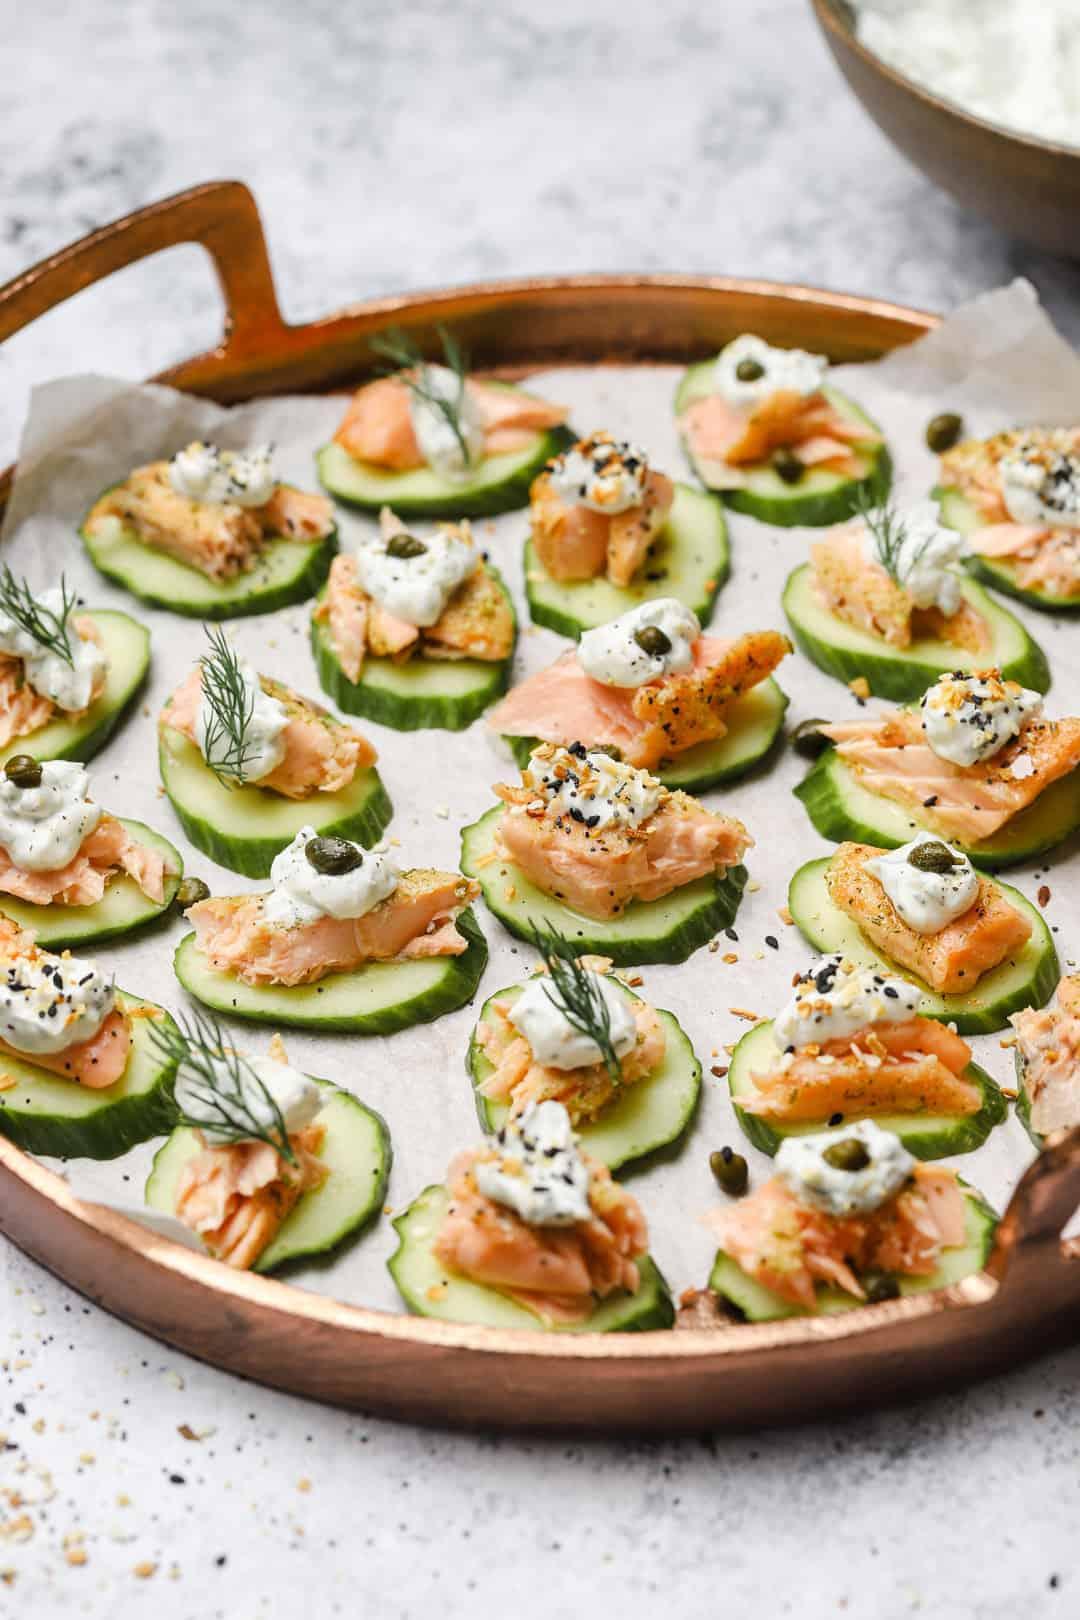 Cucumber stacks with greek yogurt and salmon